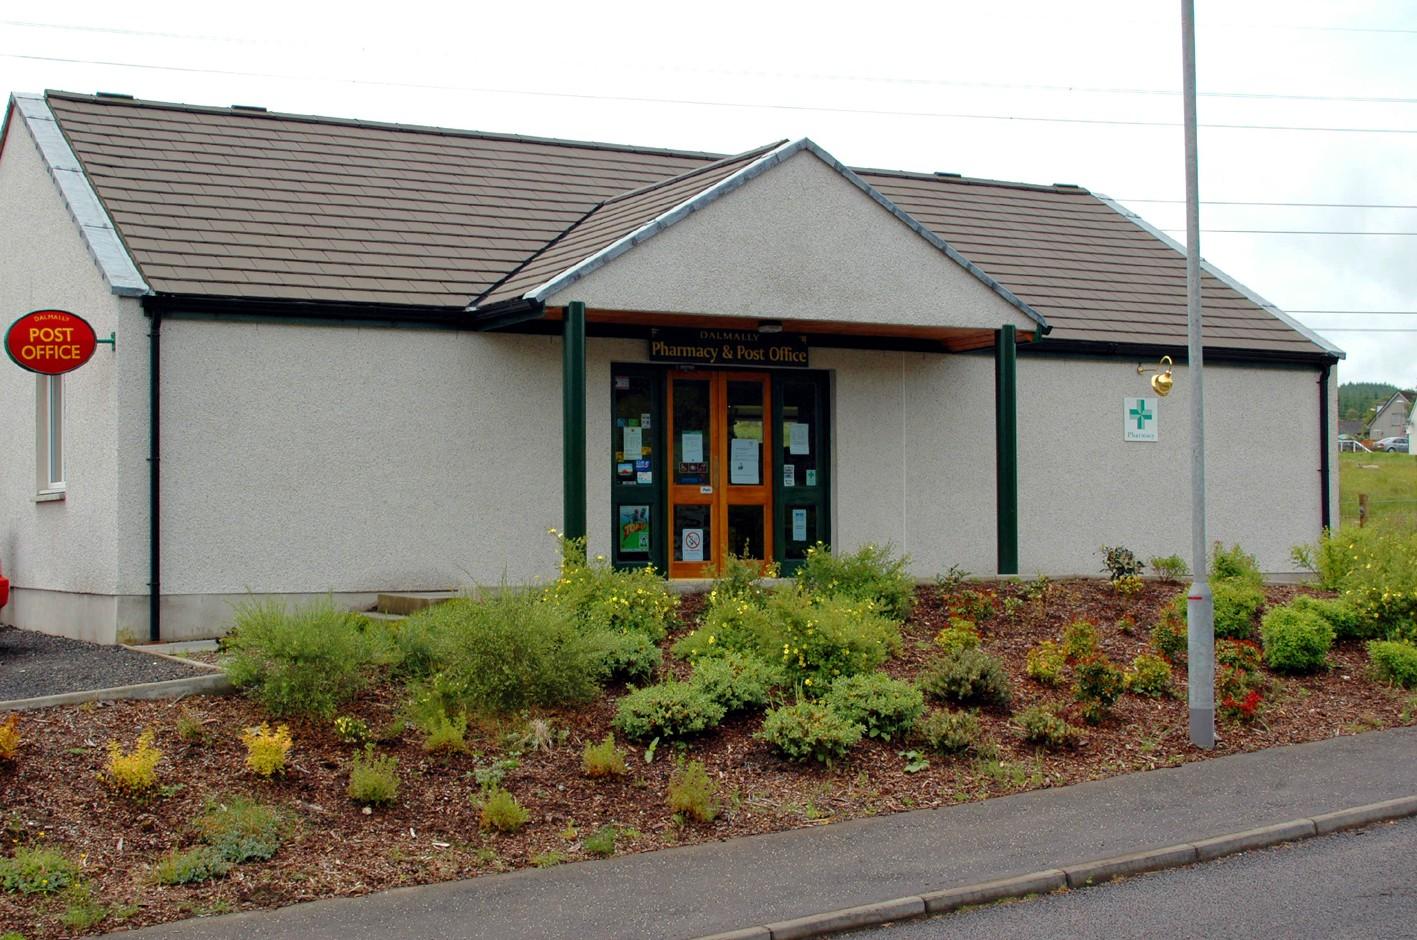 Dalmally Pharmacy – Dalmally, Scotland